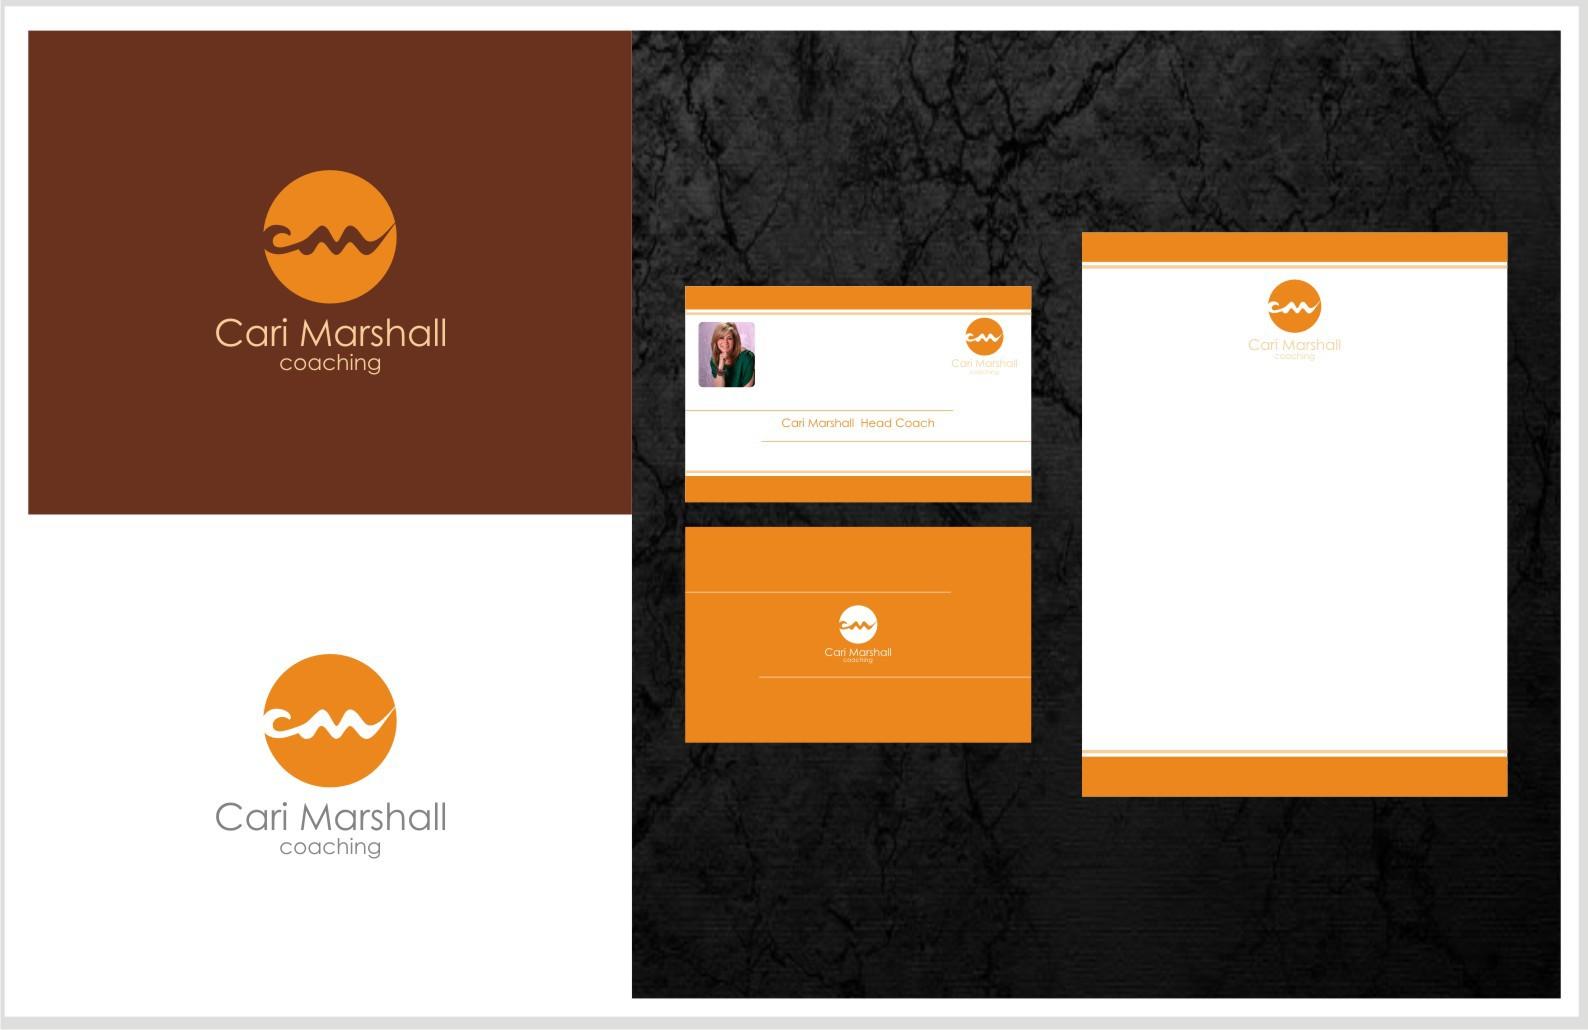 Cari Marshall Coaching needs a new logo